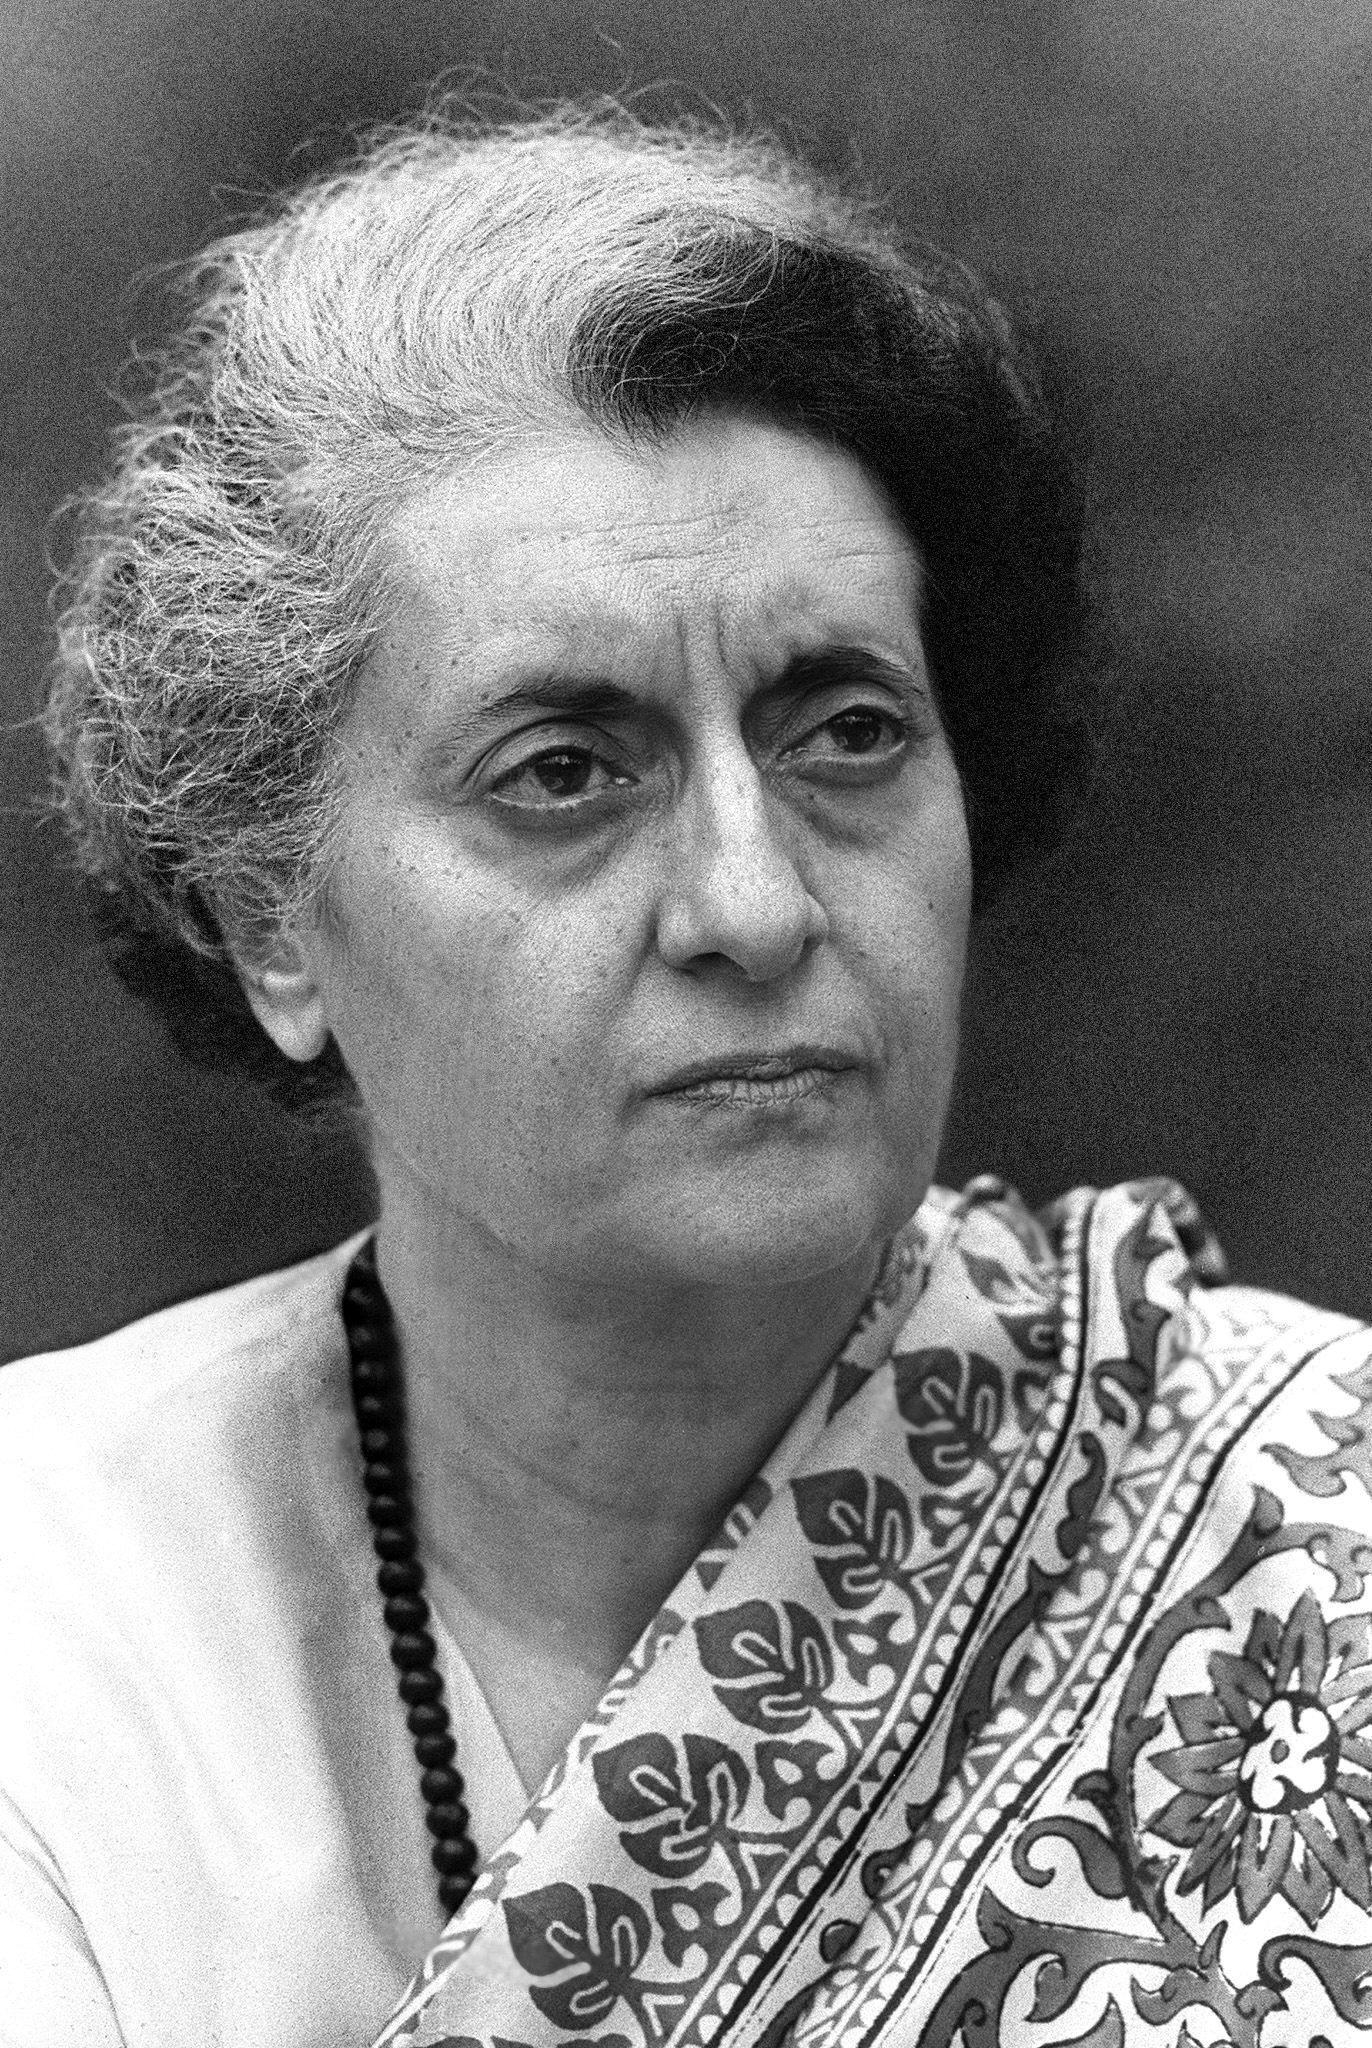 indra gandhi Chogrm meeting, new delhi, september 1980 - indian prime minister indira gandhi alongside new zealand prime minister robert muldoon (20497892084) jpg 5,524 × 2,024 896 kb el resultado electoral ratifica la politica trazada por indira ganhi (13451482013)jpg 809 × 1,177.